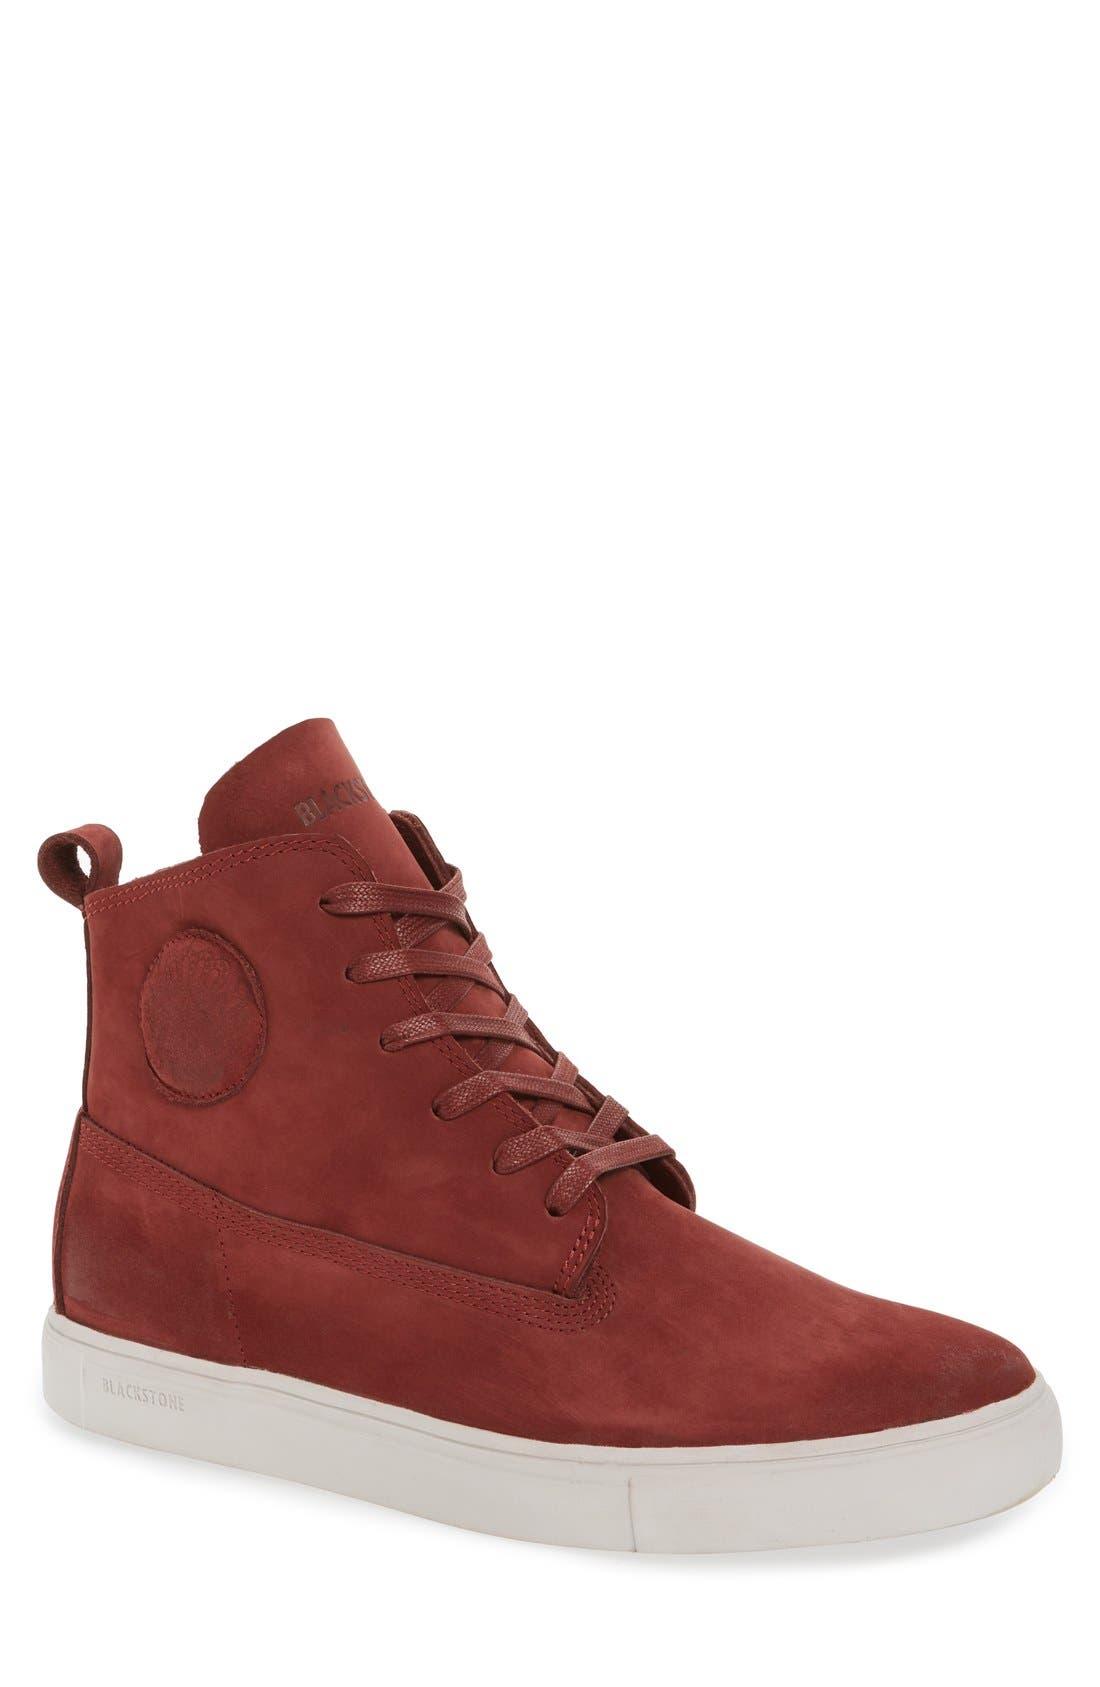 'MM33' High Top Sneaker,                             Main thumbnail 1, color,                             Port